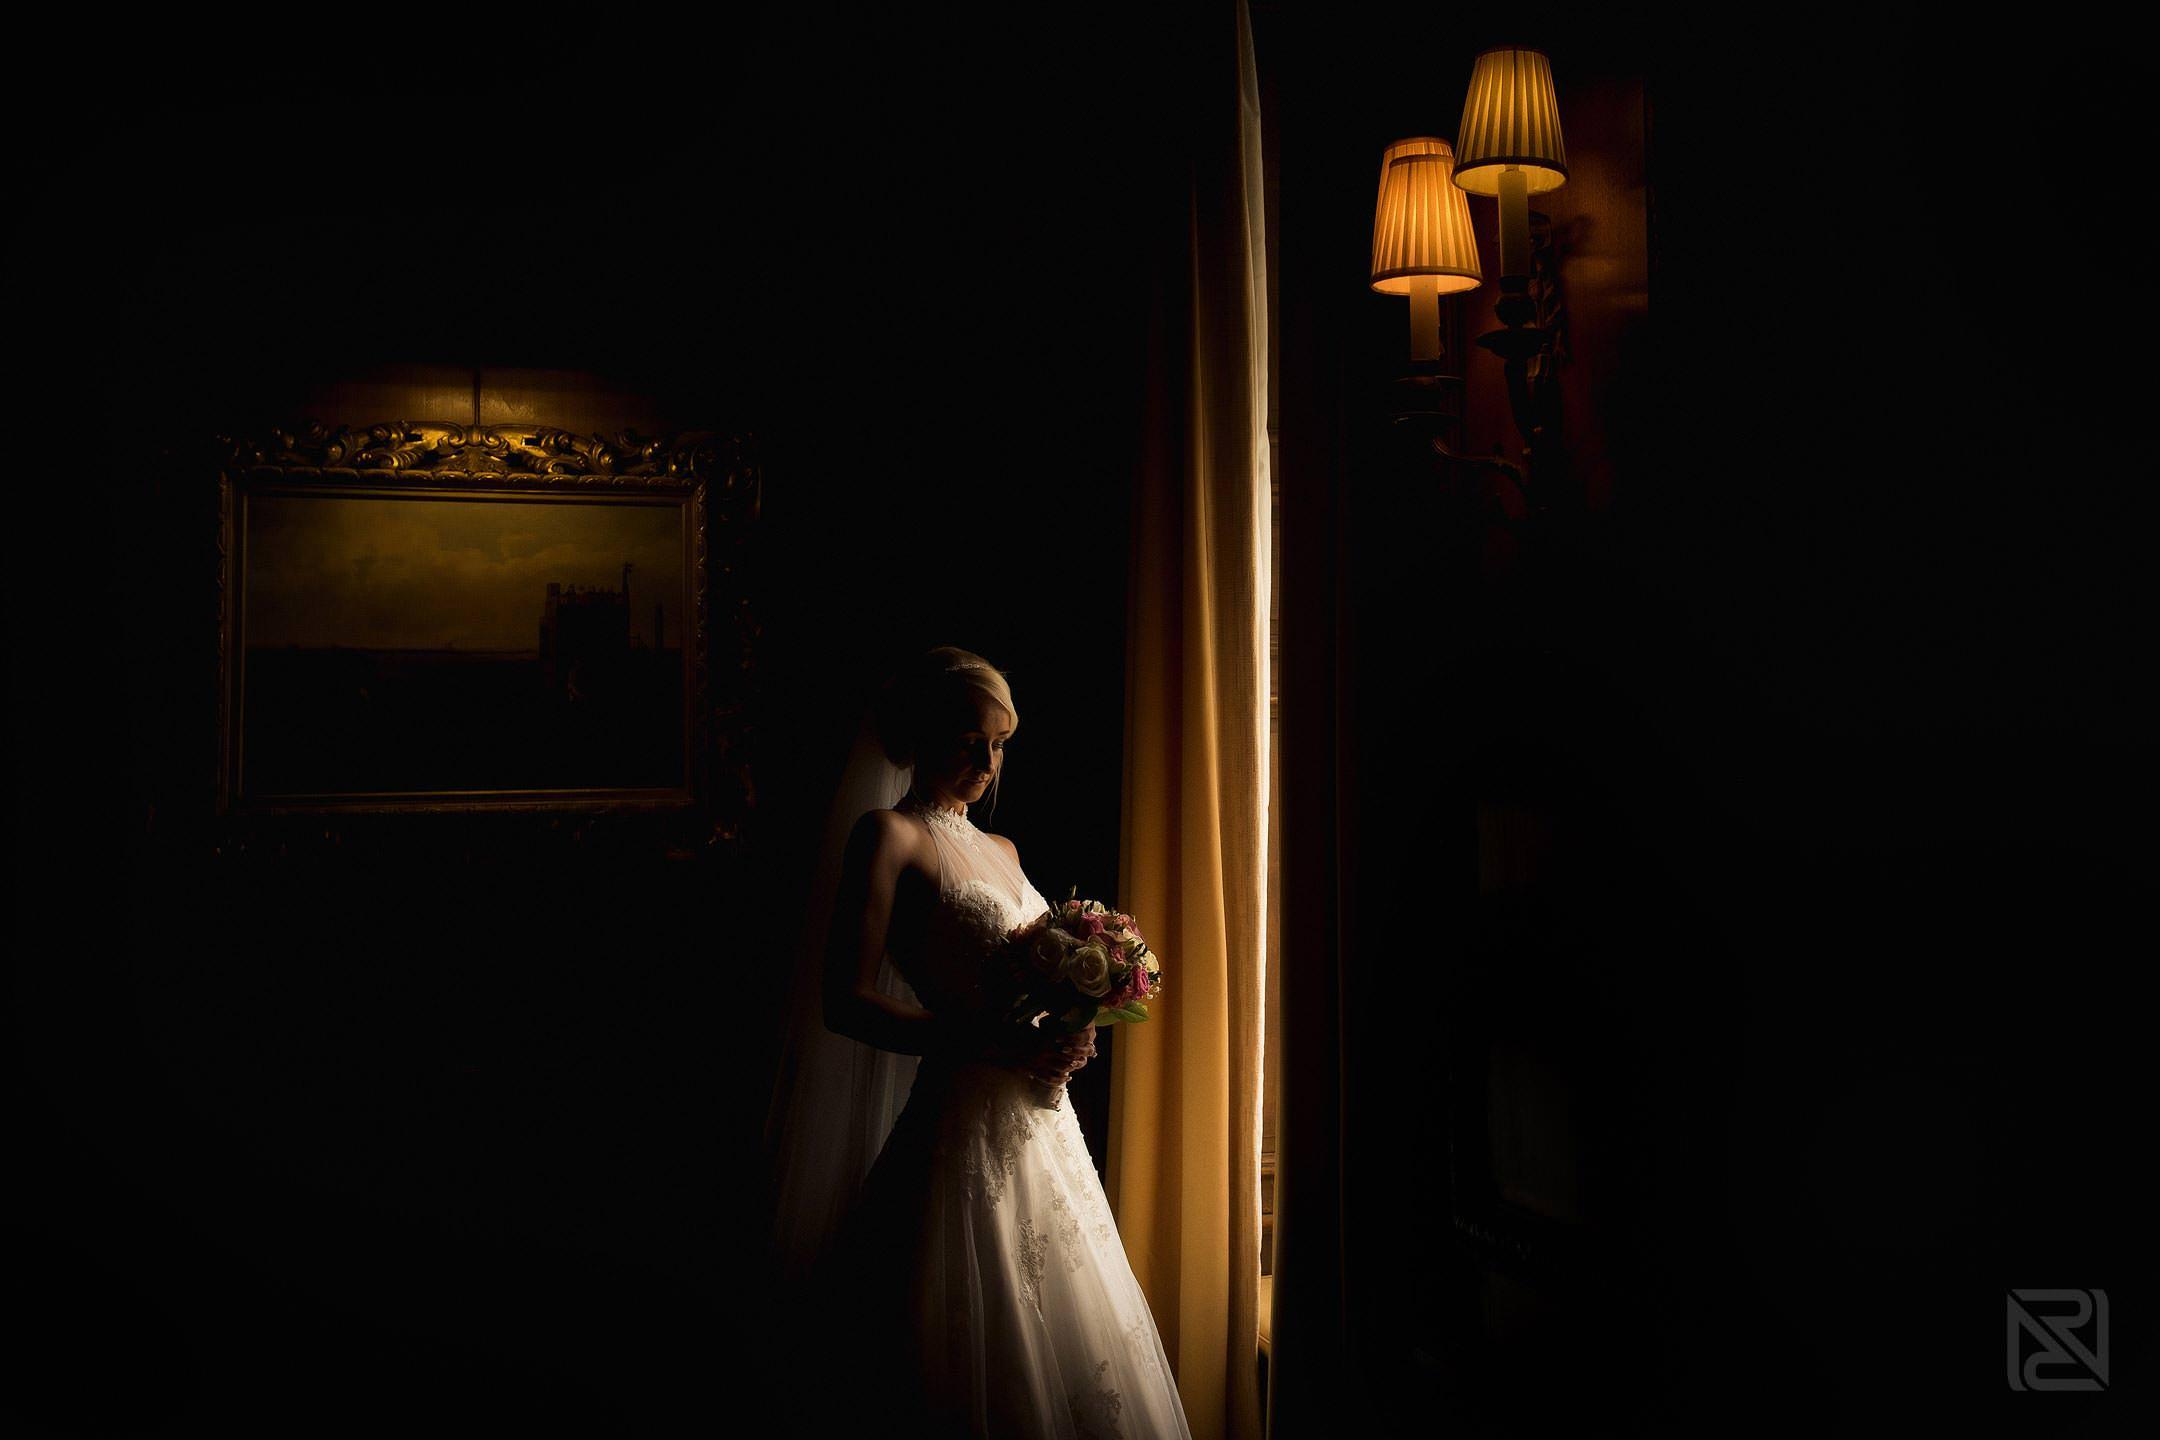 best-wedding-photographs-2015-037